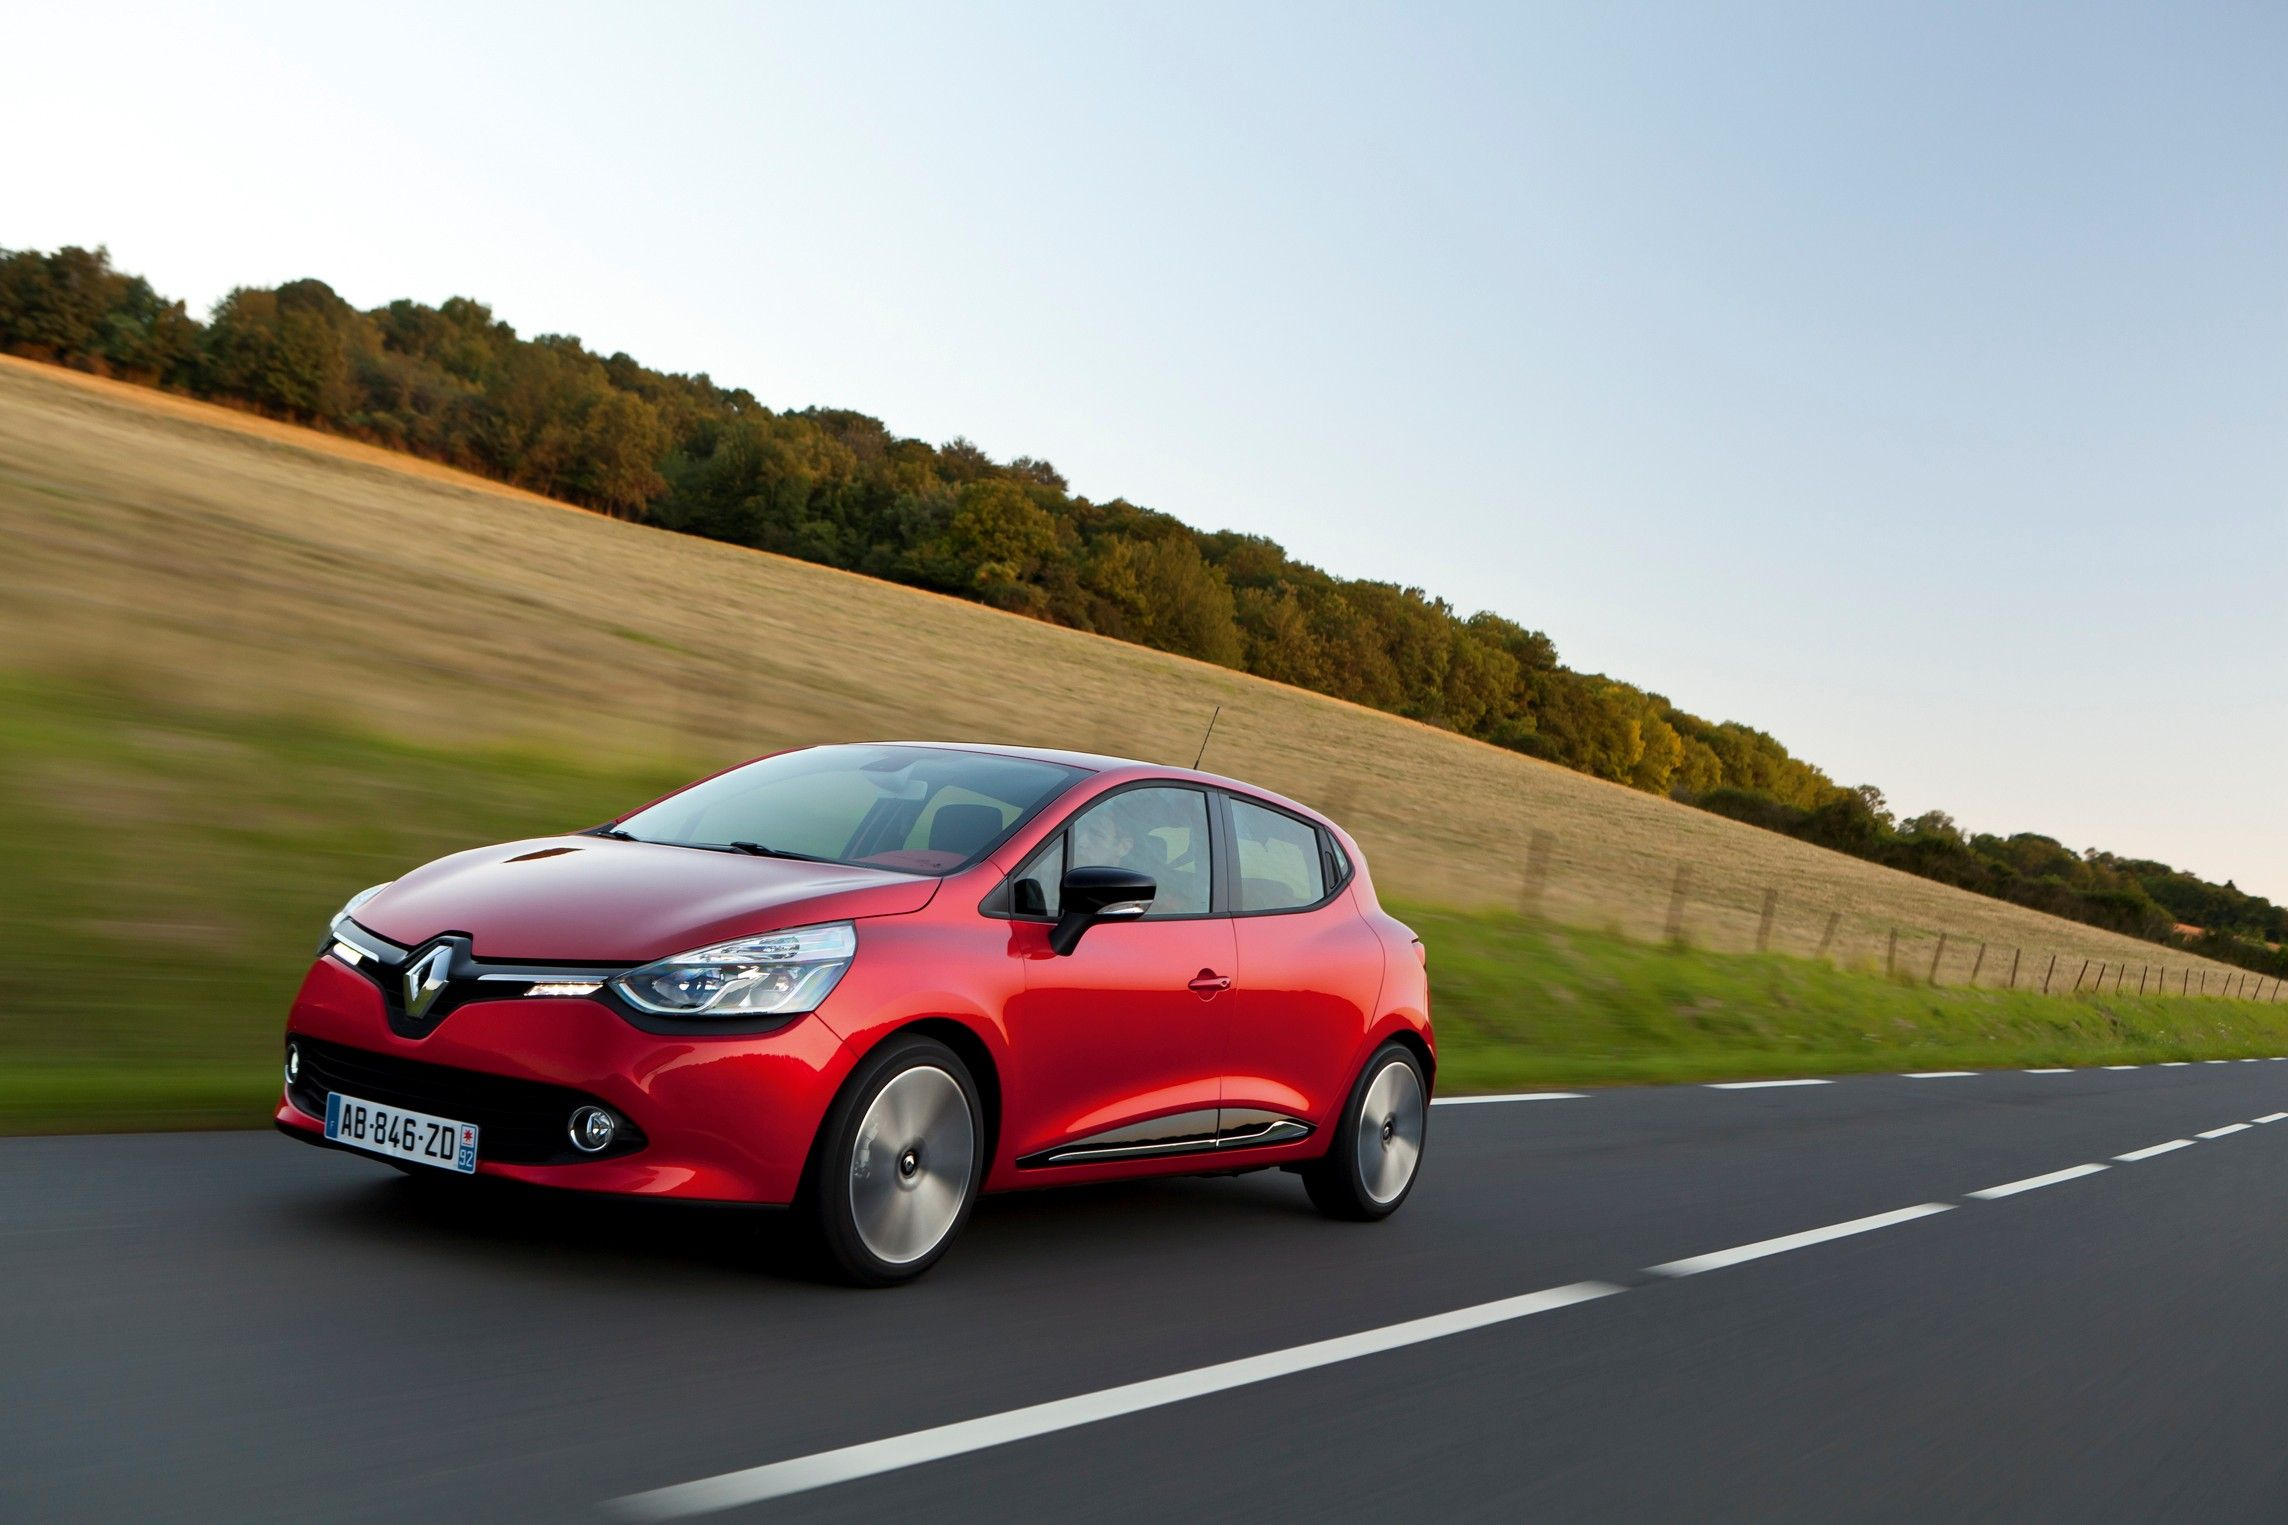 Nuova Renault Clio. Hot Hatches rock.